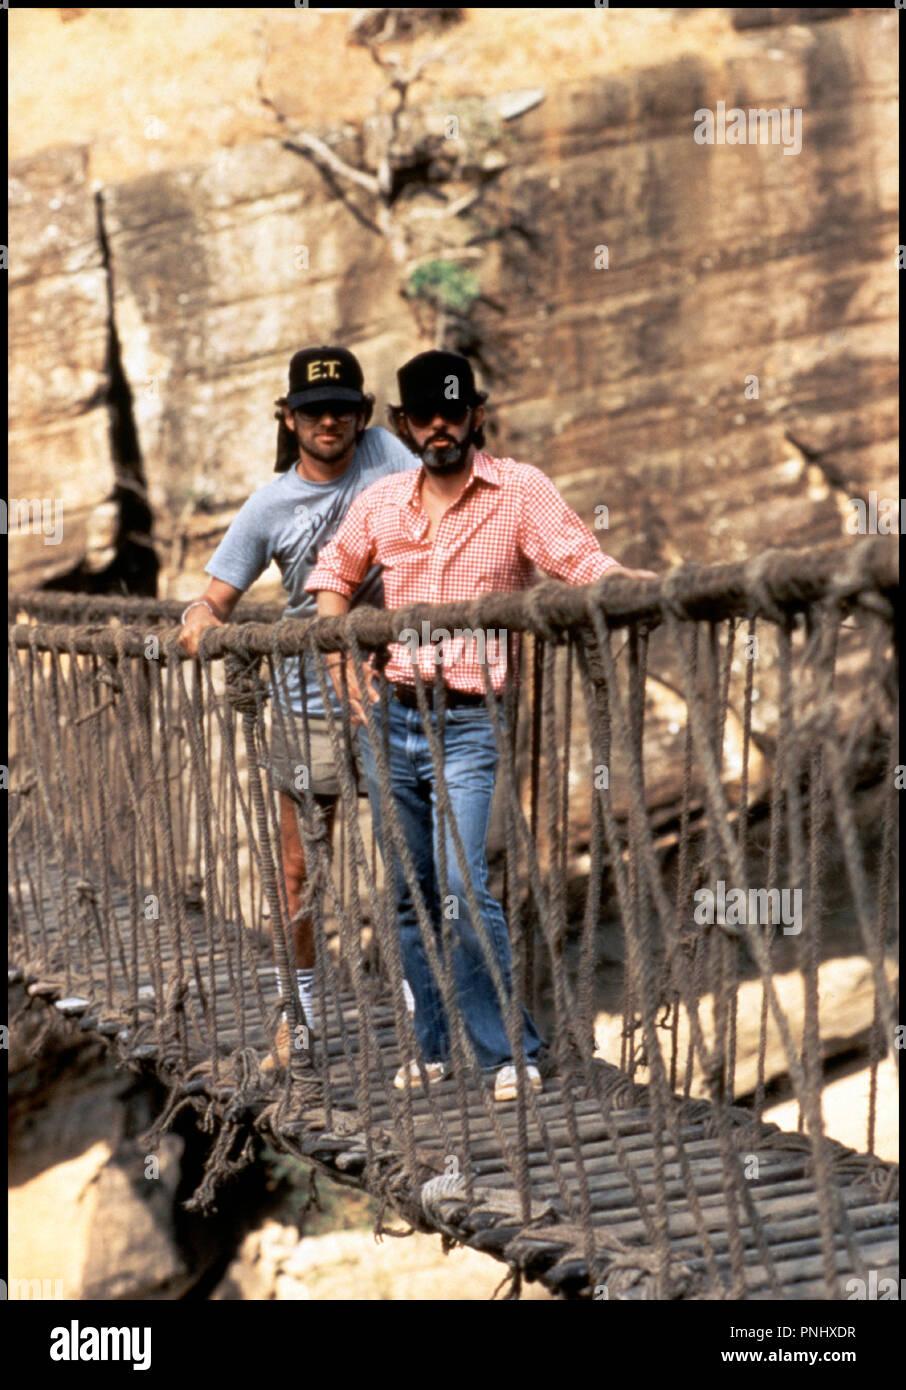 Prod DB © Lucasfilm   DR INDIANA JONES ET LE TEMPLE MAUDIT (INDIANA JONES  Y EL TEMPLO DE DOOM) fd0146c476a